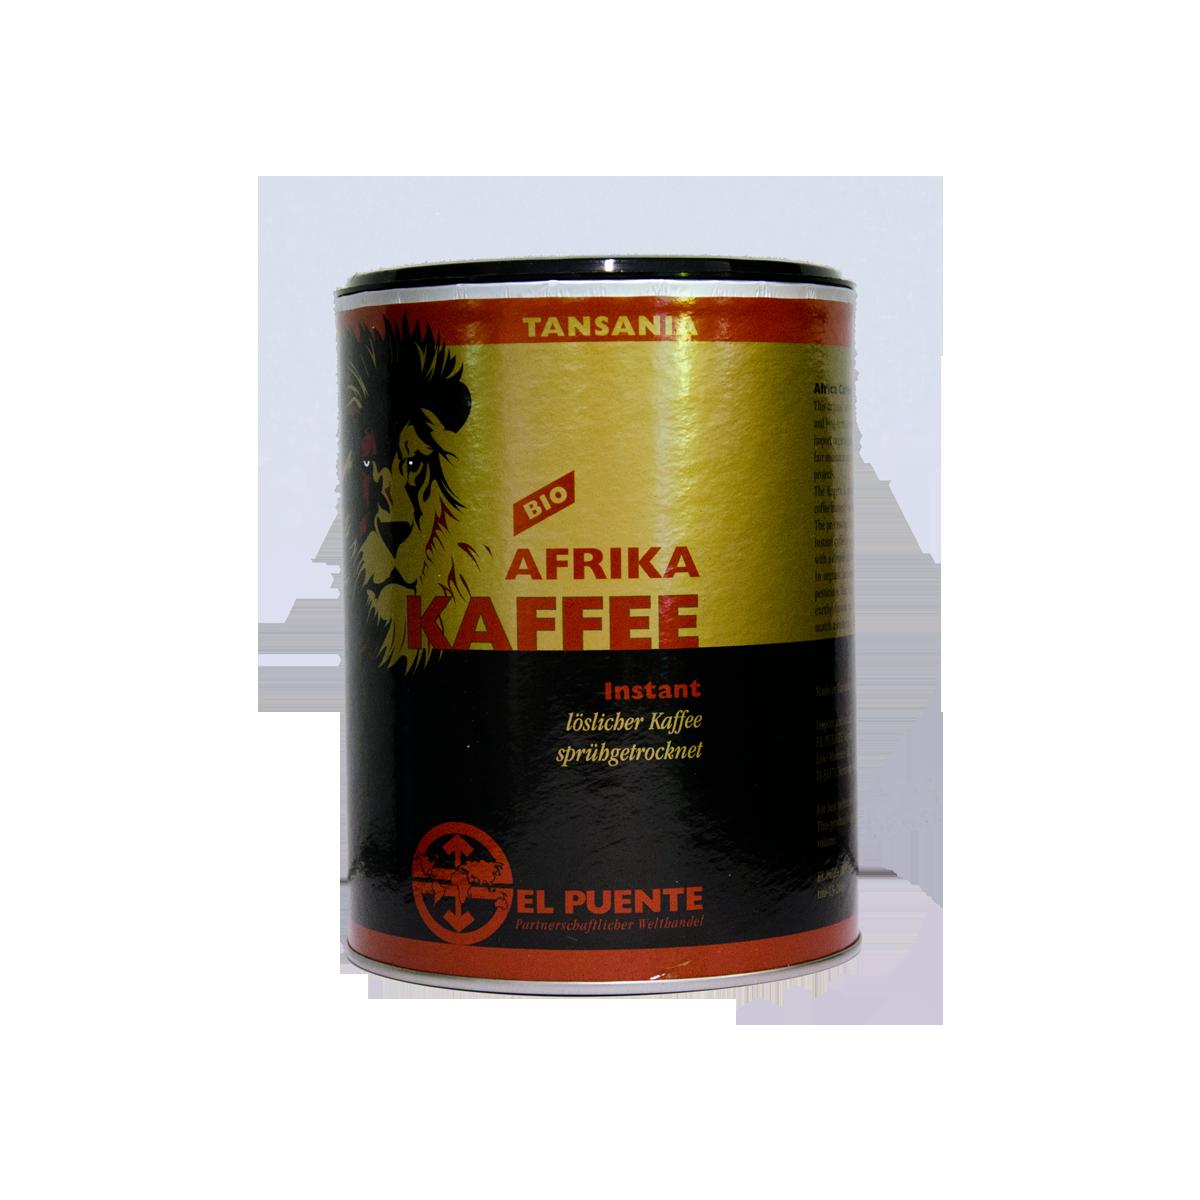 afrikakaffe